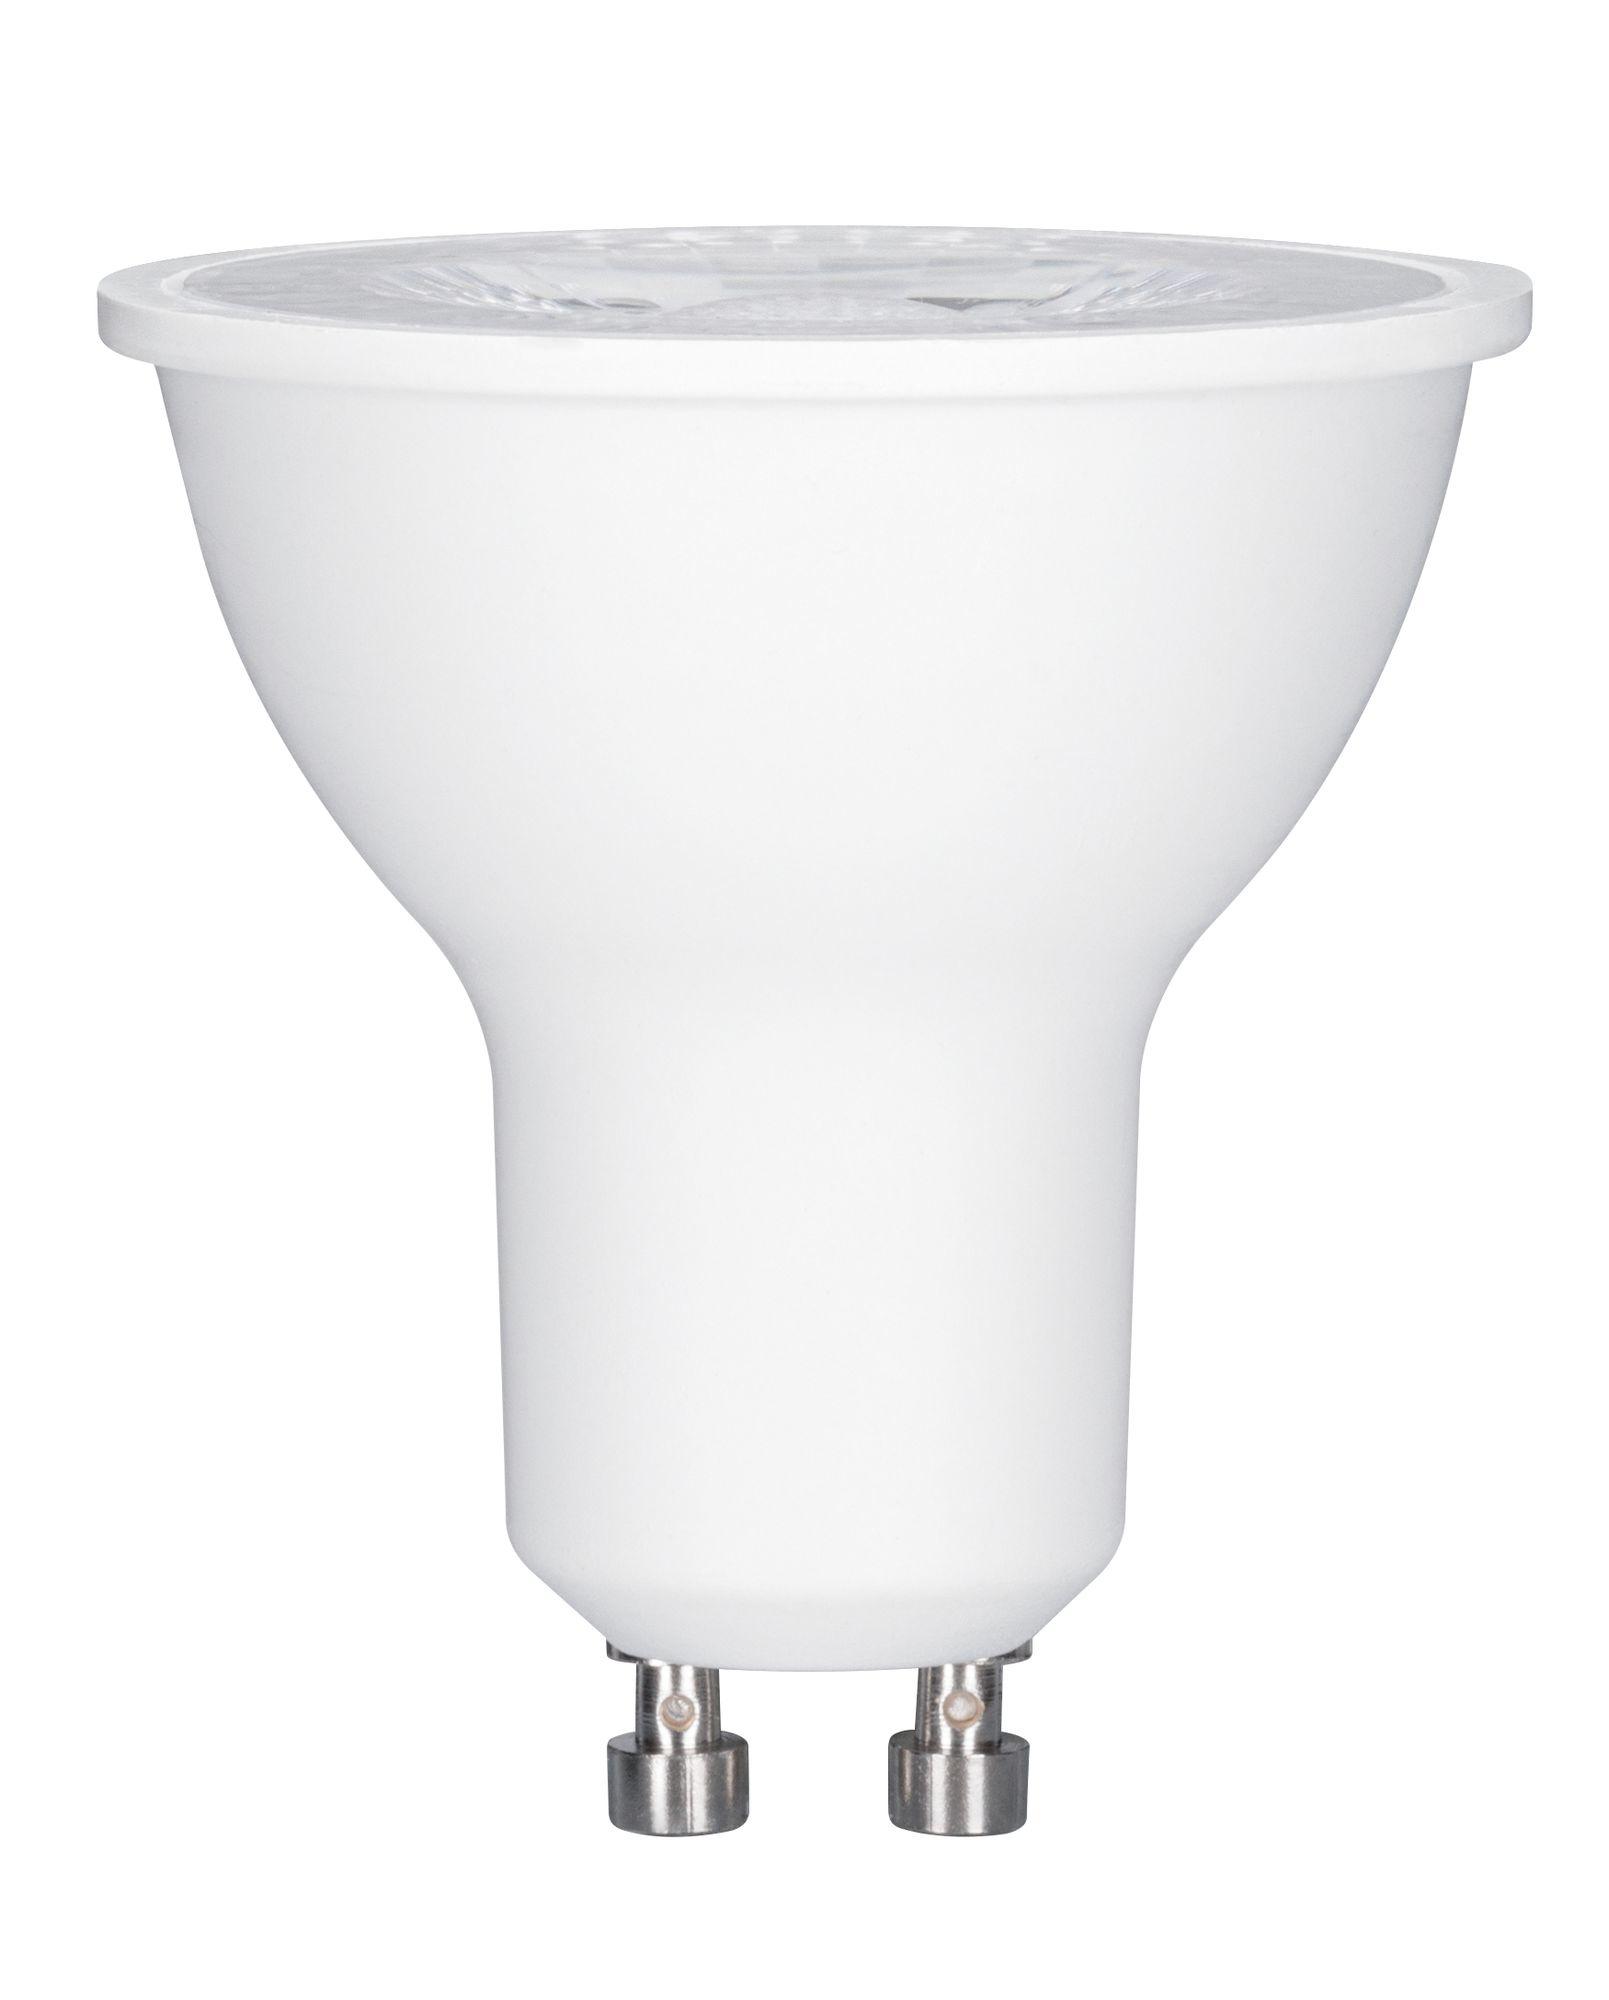 Paulmann LED 6 Watt GU10 1.800 - 3.000K dim to warm